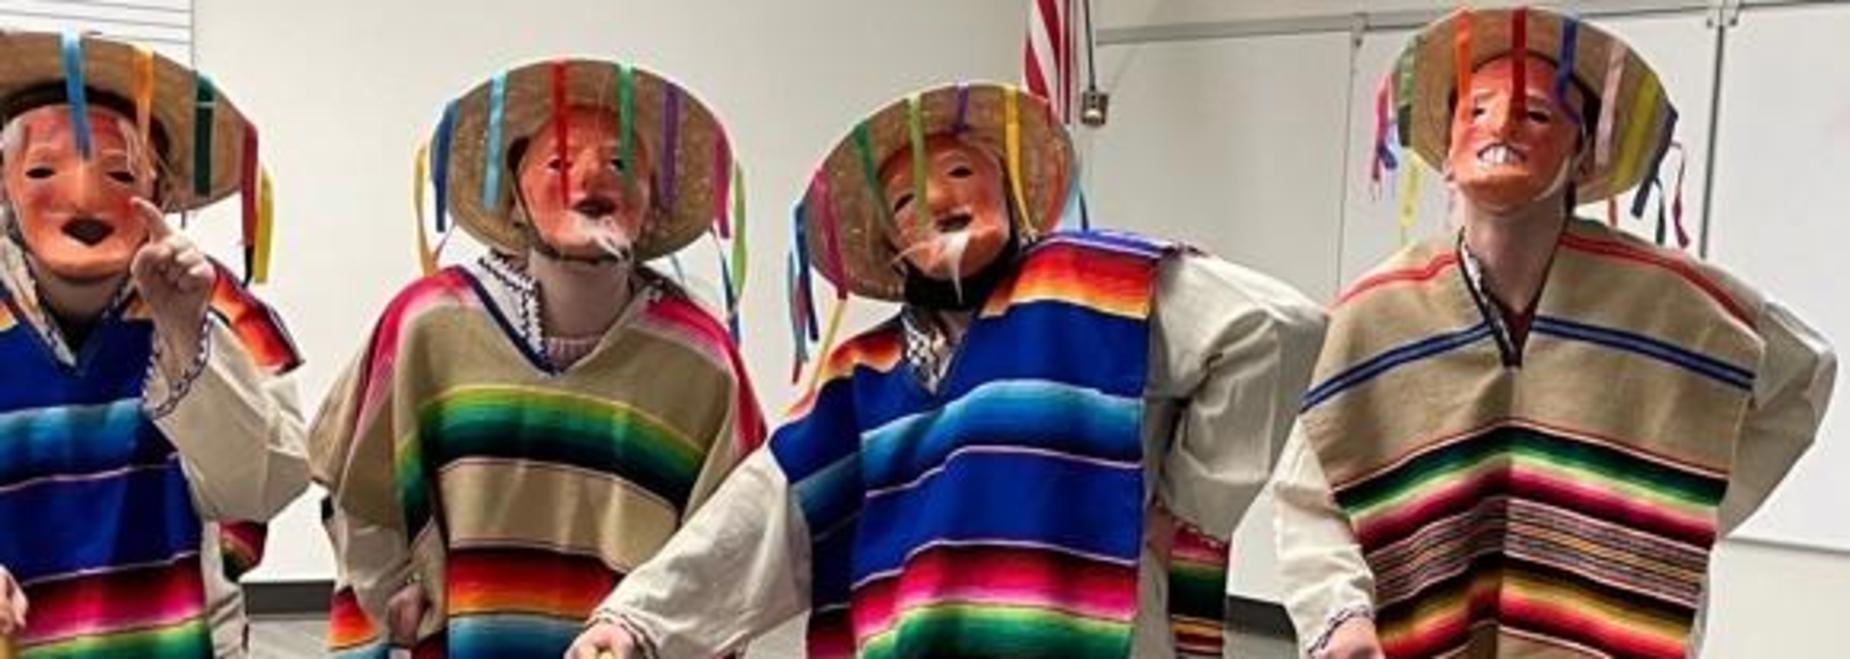 8th grade Challenge Spanish class University of Wyoming World Language Day performance.